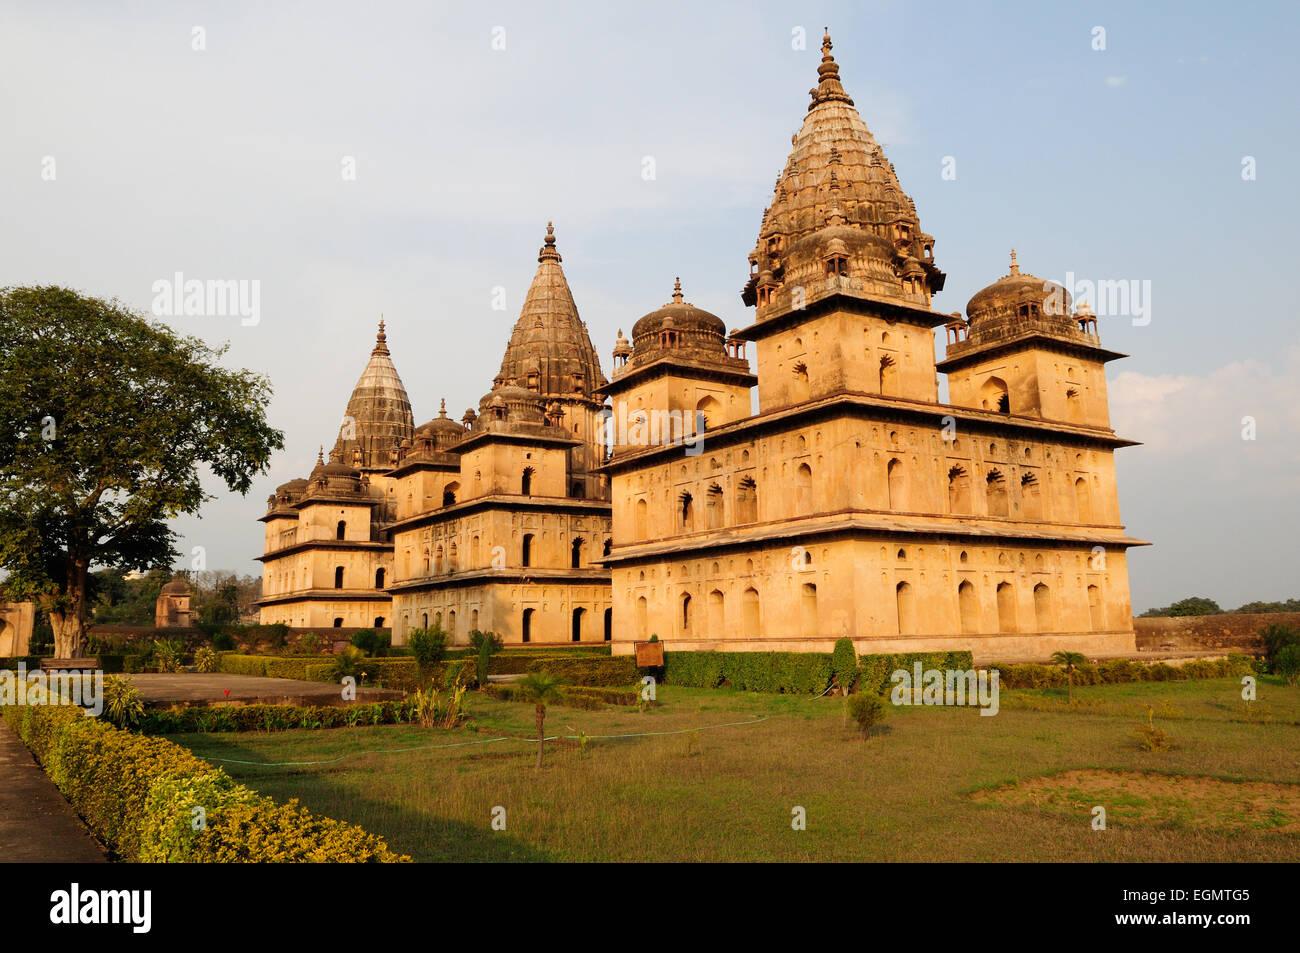 Royal Cenotaphs or chhatris Orchha Madhya Pradesh India - Stock Image